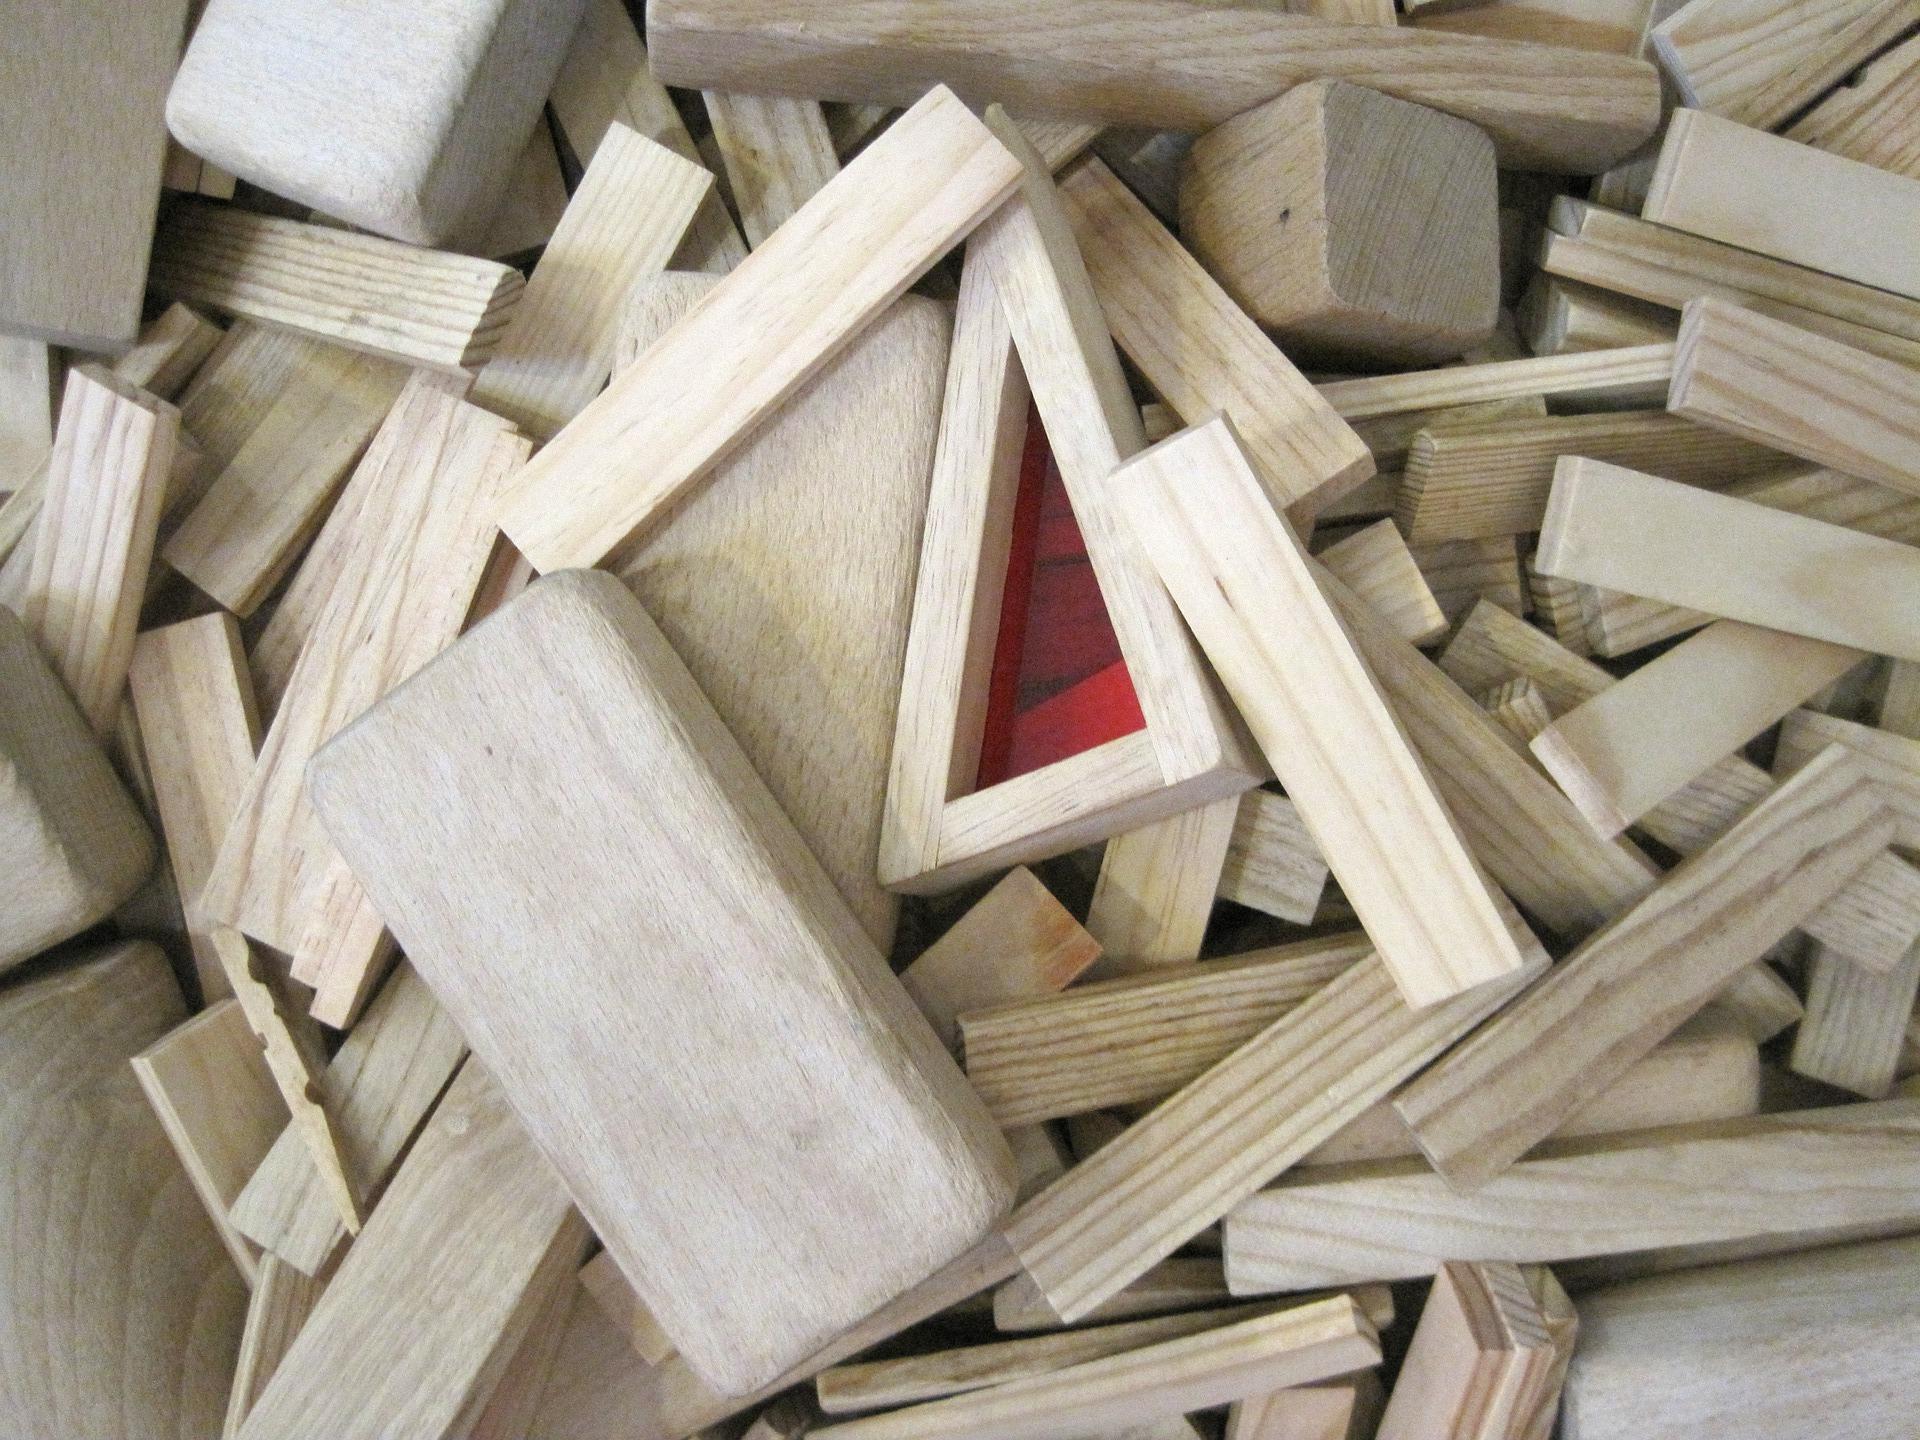 building-blocks-2984574_1920.jpg